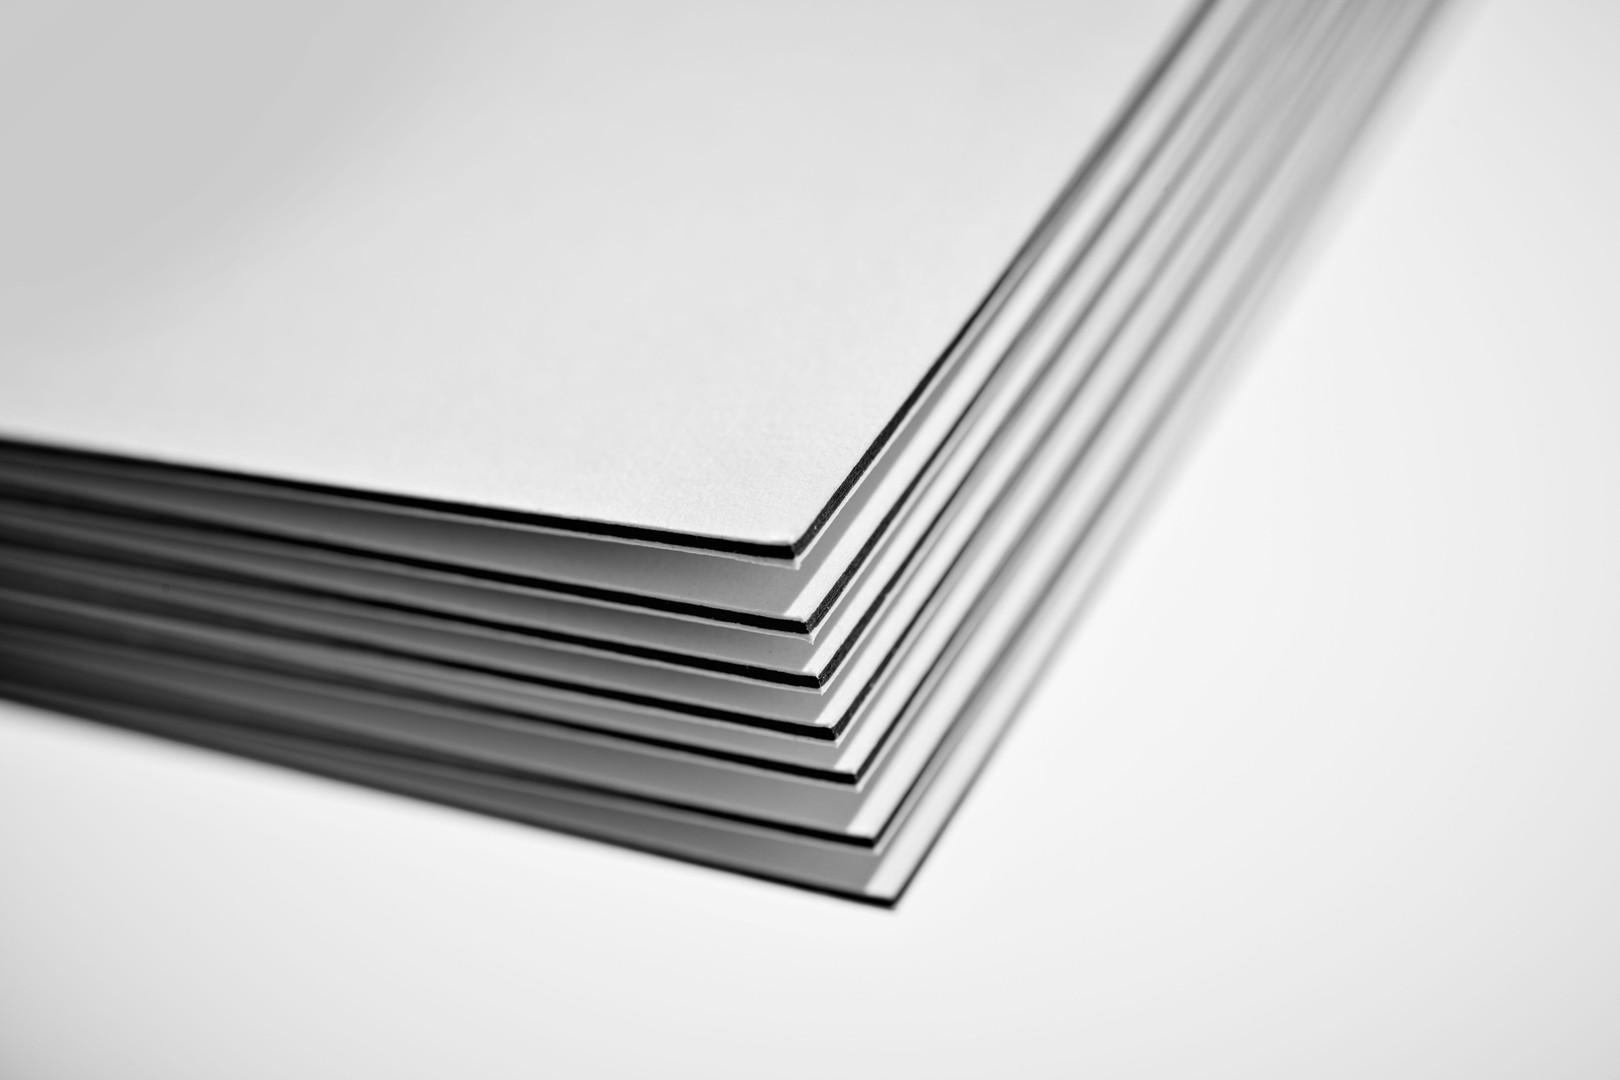 kleoncards_paper_black_core_01.jpg